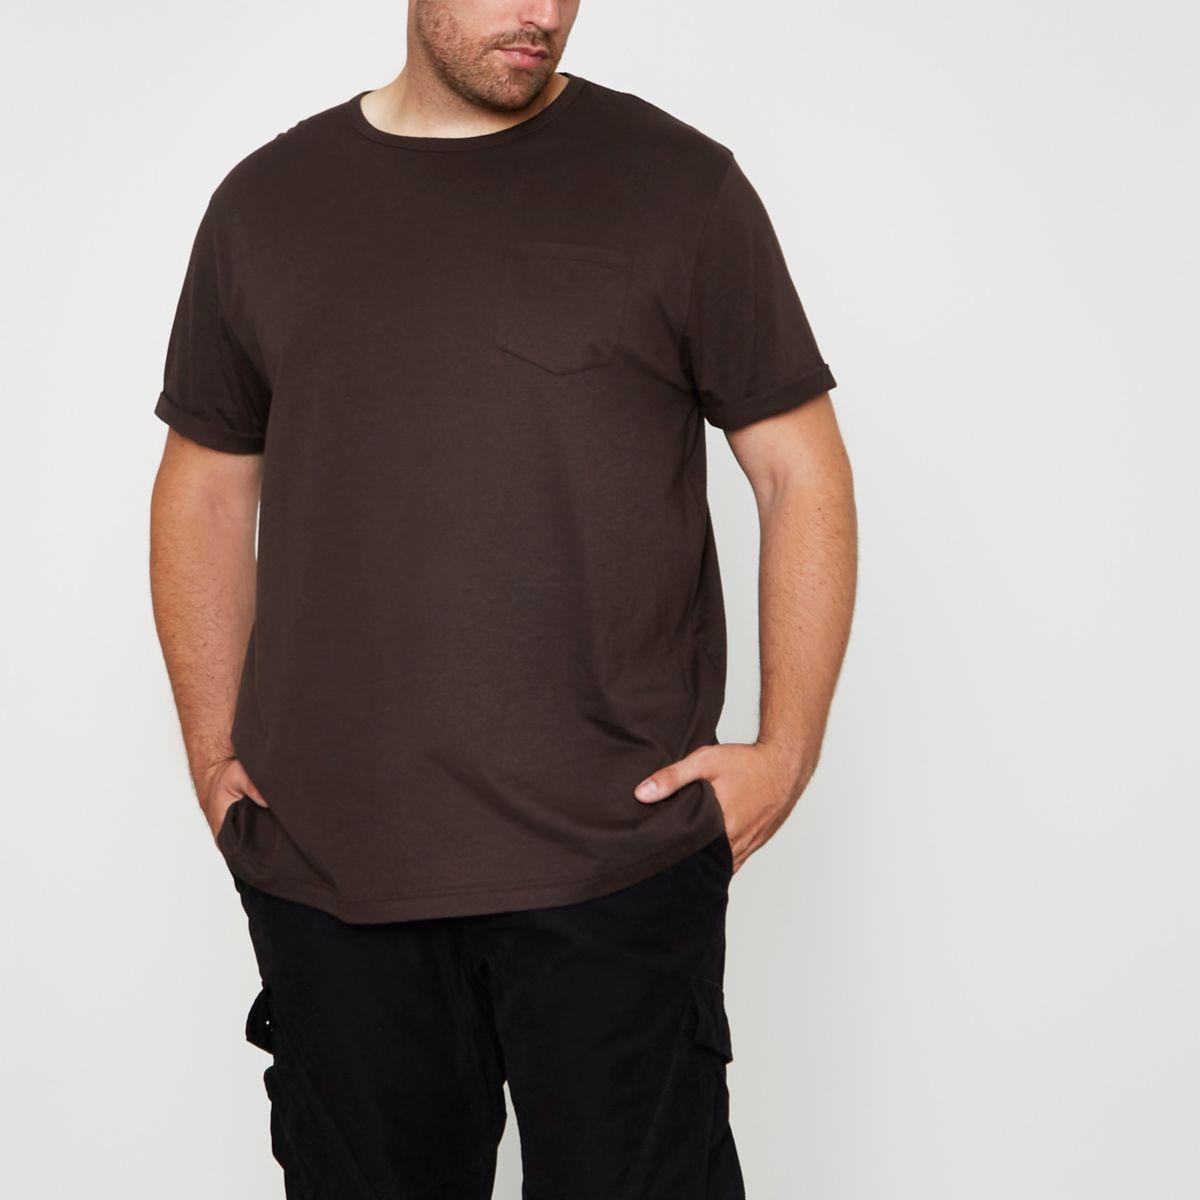 Big & Tall – T-shirt marron à manches retroussées